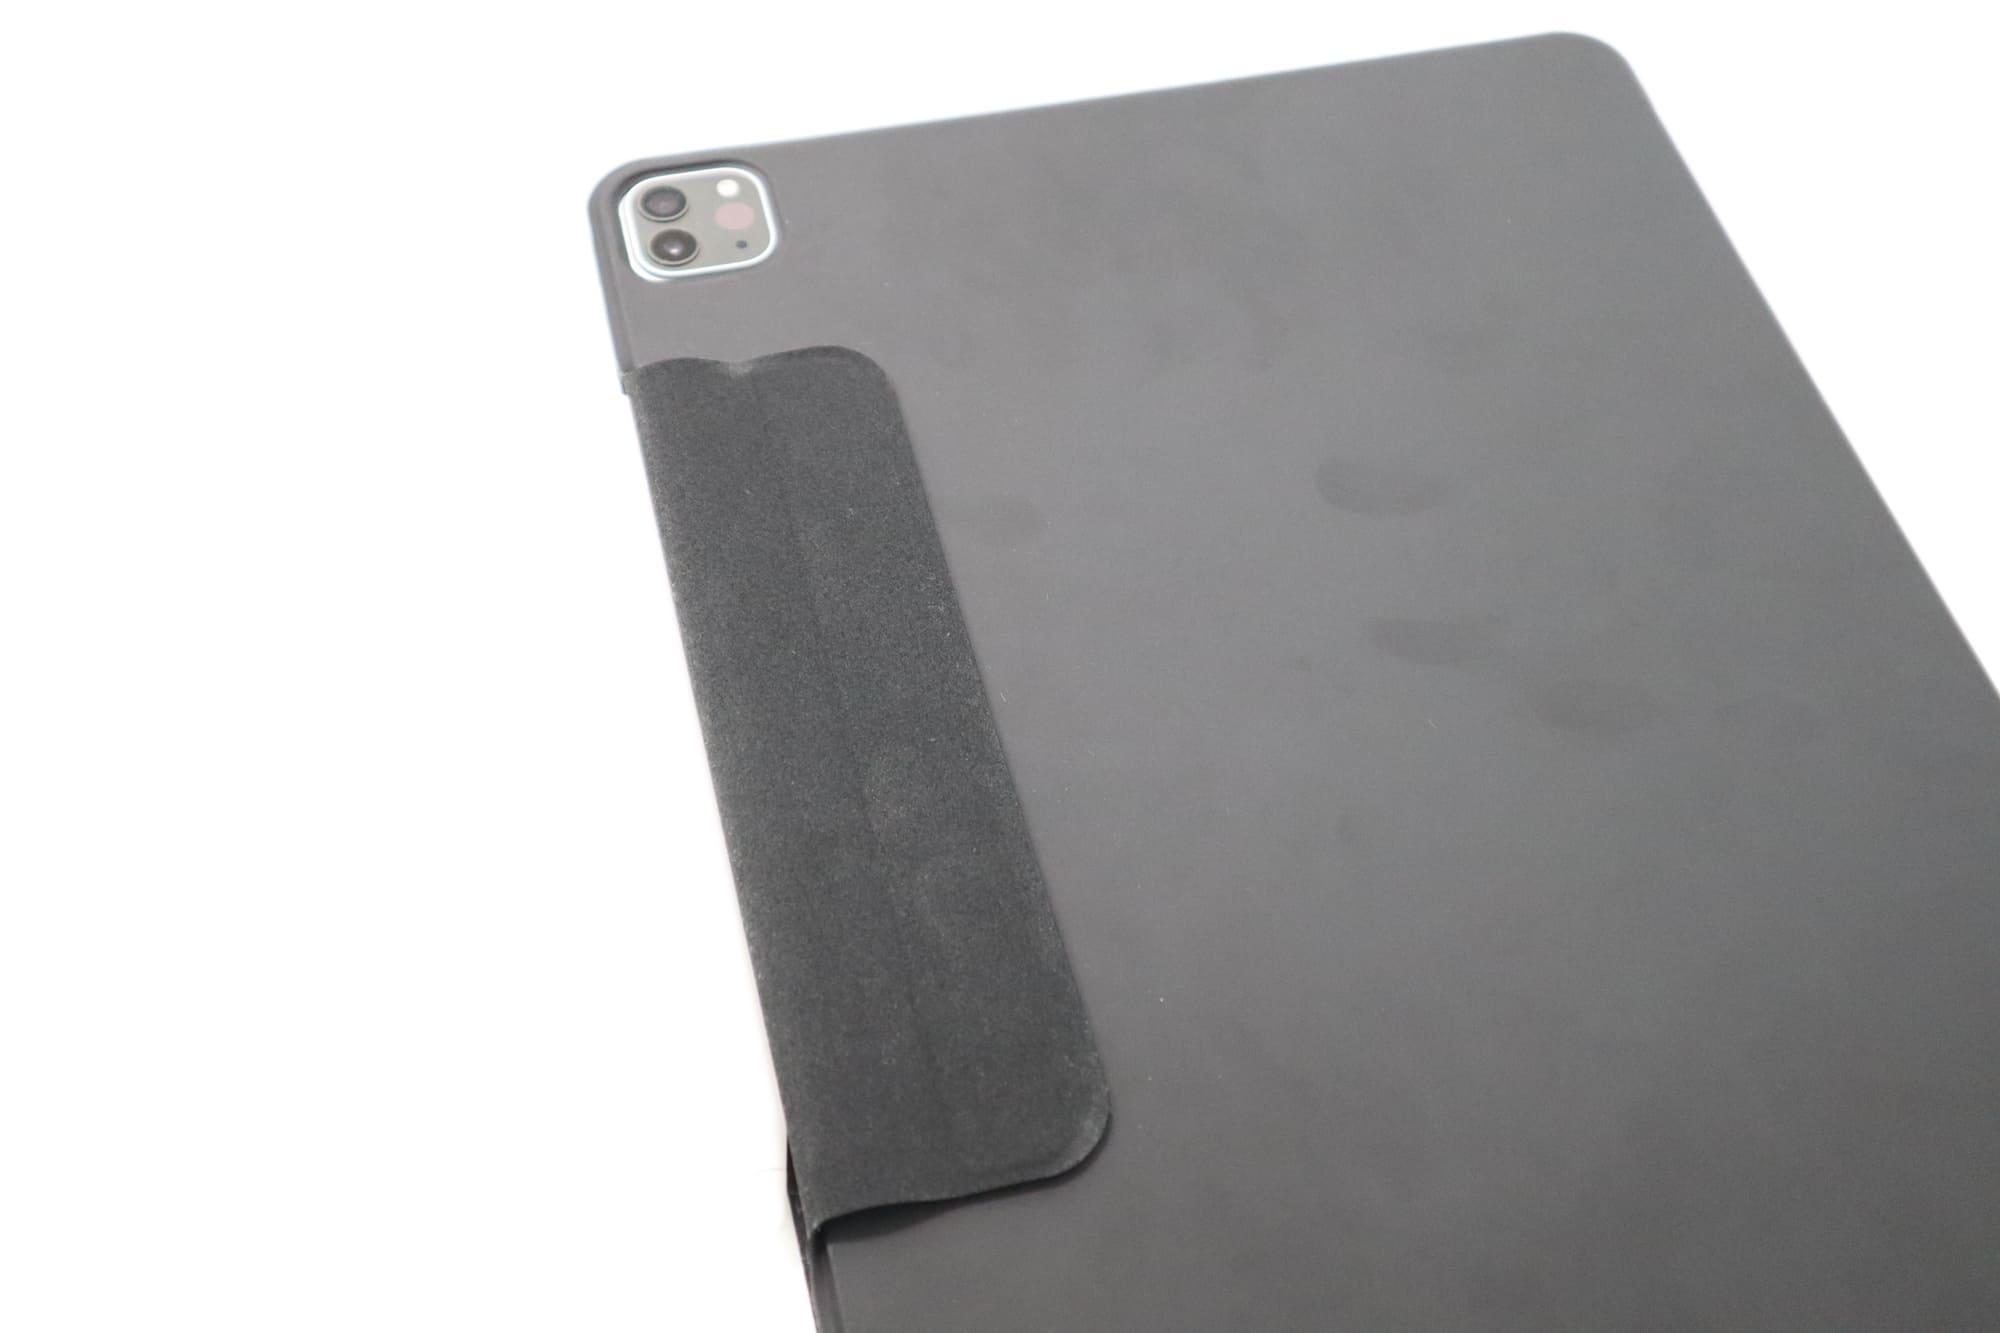 ESRのiPad Pro用ケースのApple Pencil保護部を背面に吸着